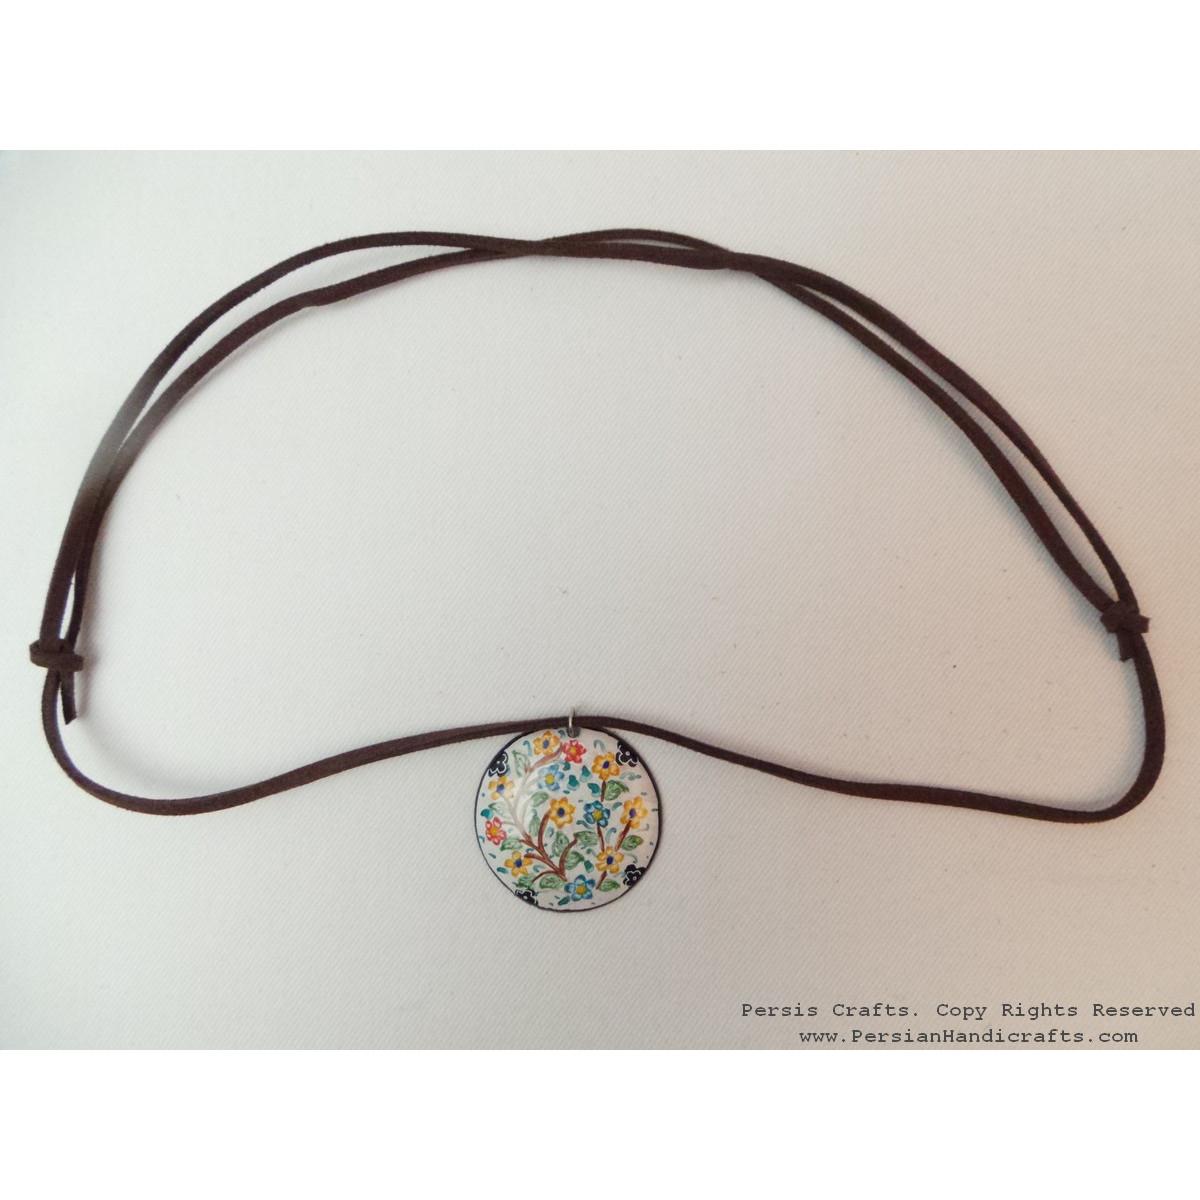 Enamel Minakari Pendant & Leather Necklace - HA3038-Persian Handicrafts